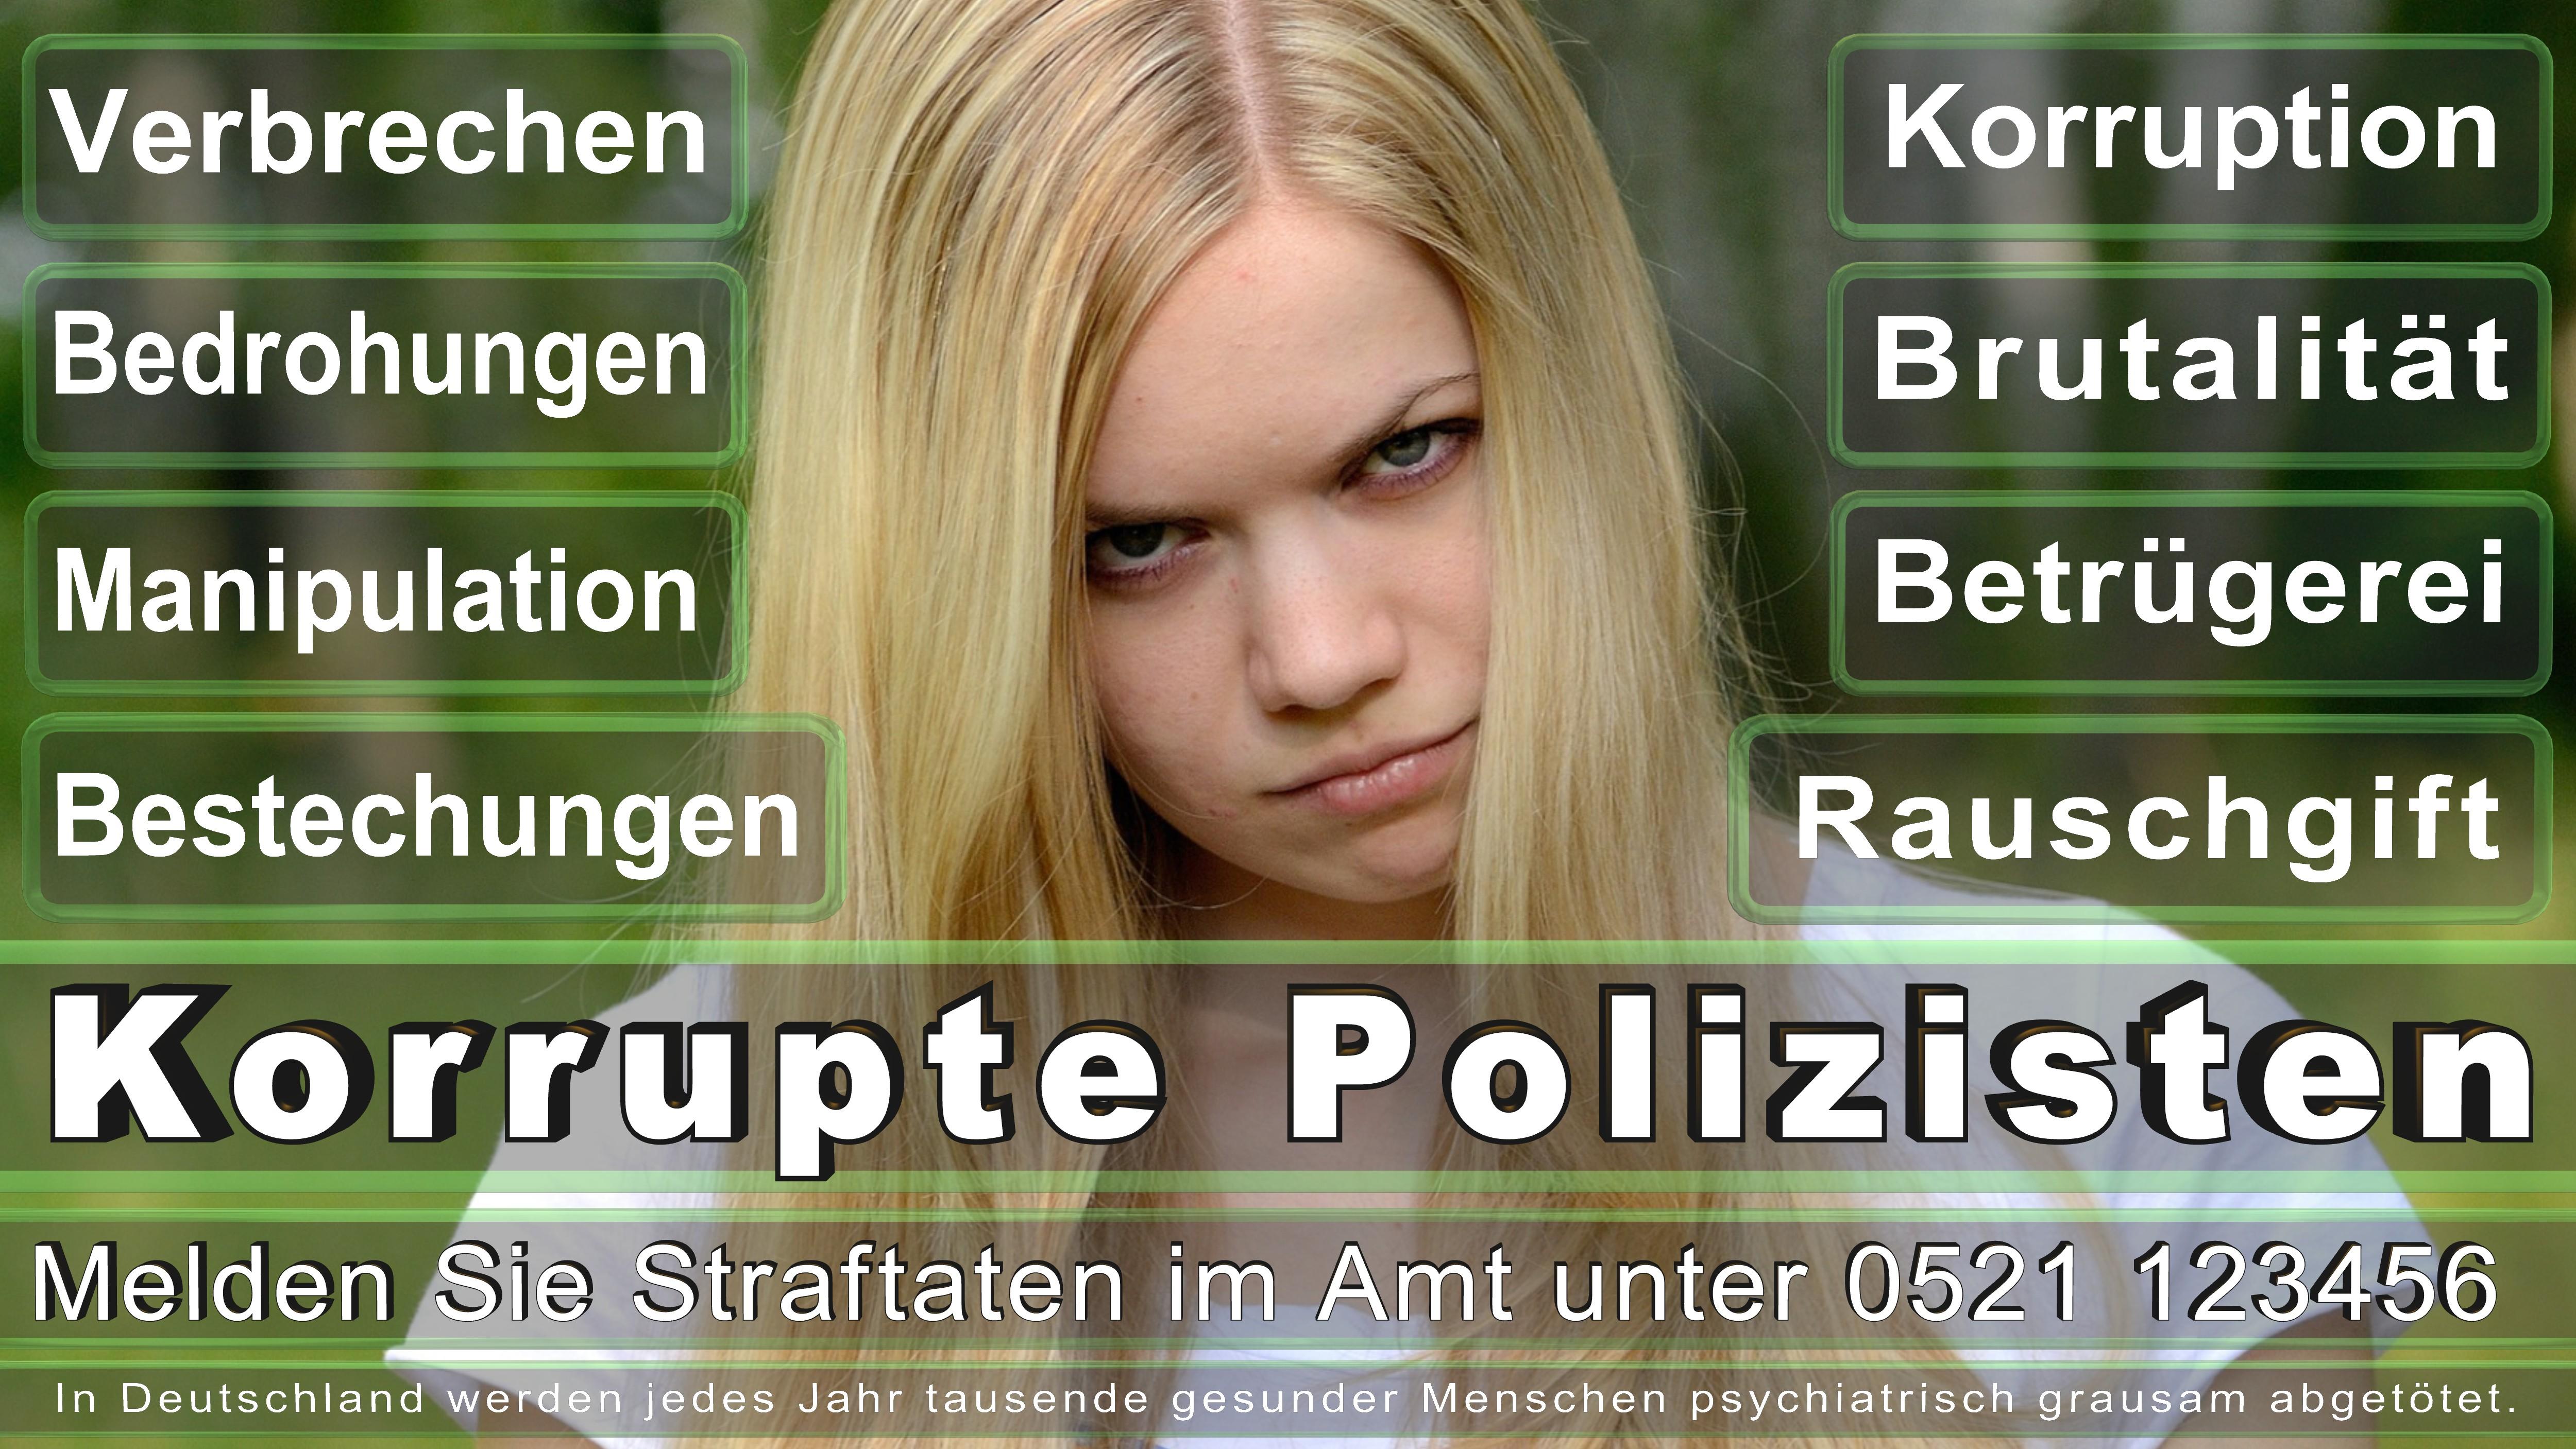 Polizei-Bielefeld-Polizei-Bielefeld-Polizei-Bielefeld (203)